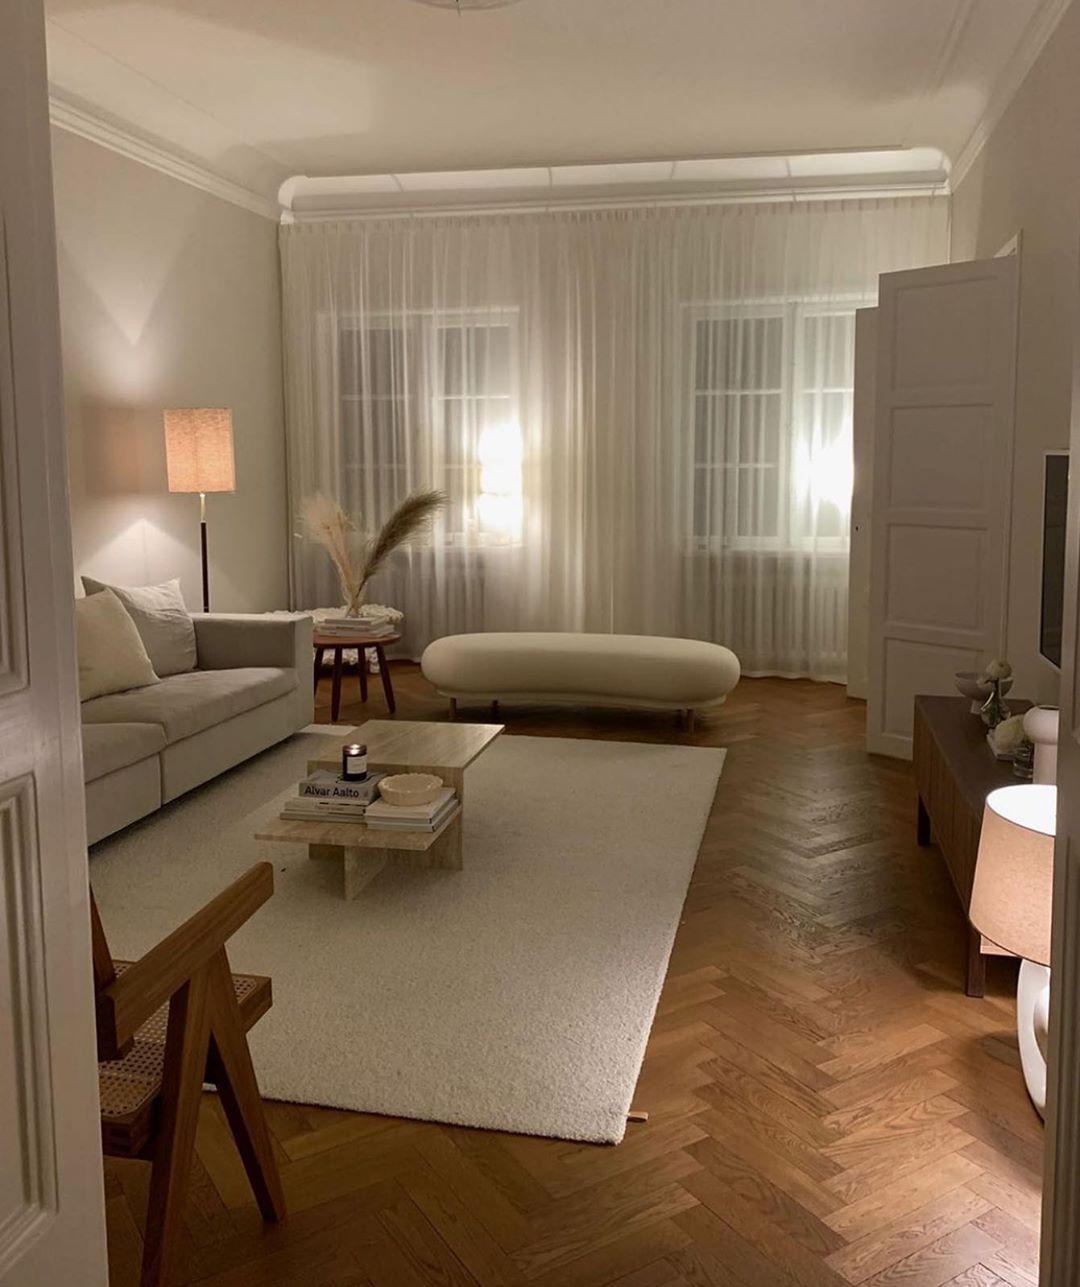 "Nordic Style Report on Instagram: ""Interior inspiration! Have a nice weekend ️  @lovisabarkman"""